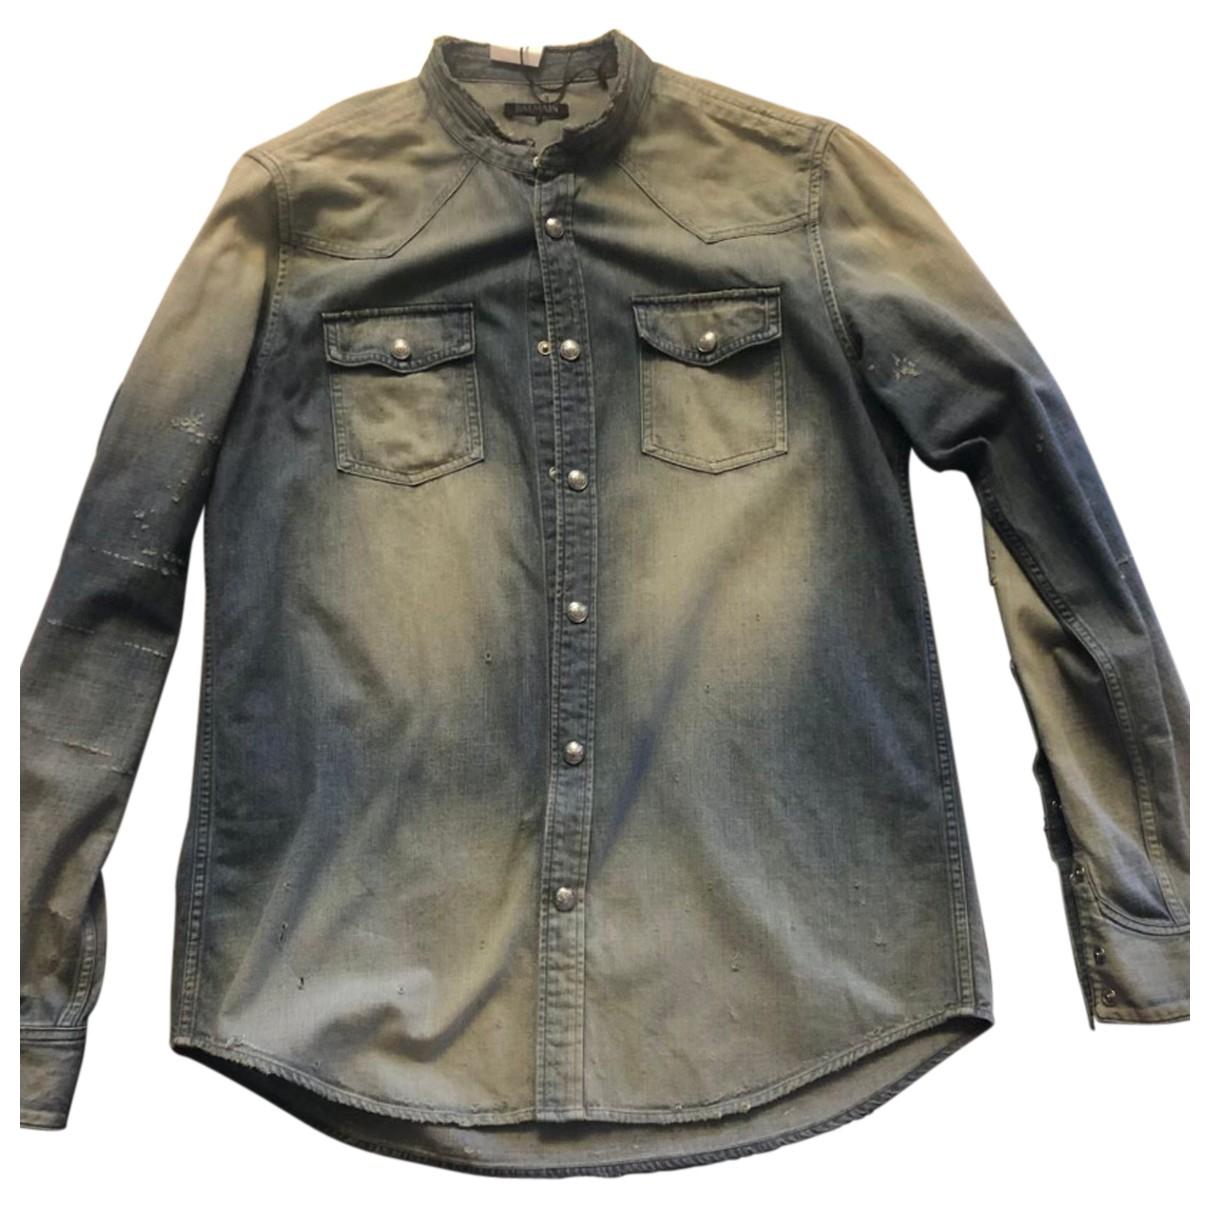 Balmain N Blue Denim - Jeans Shirts for Men 42 EU (tour de cou / collar)